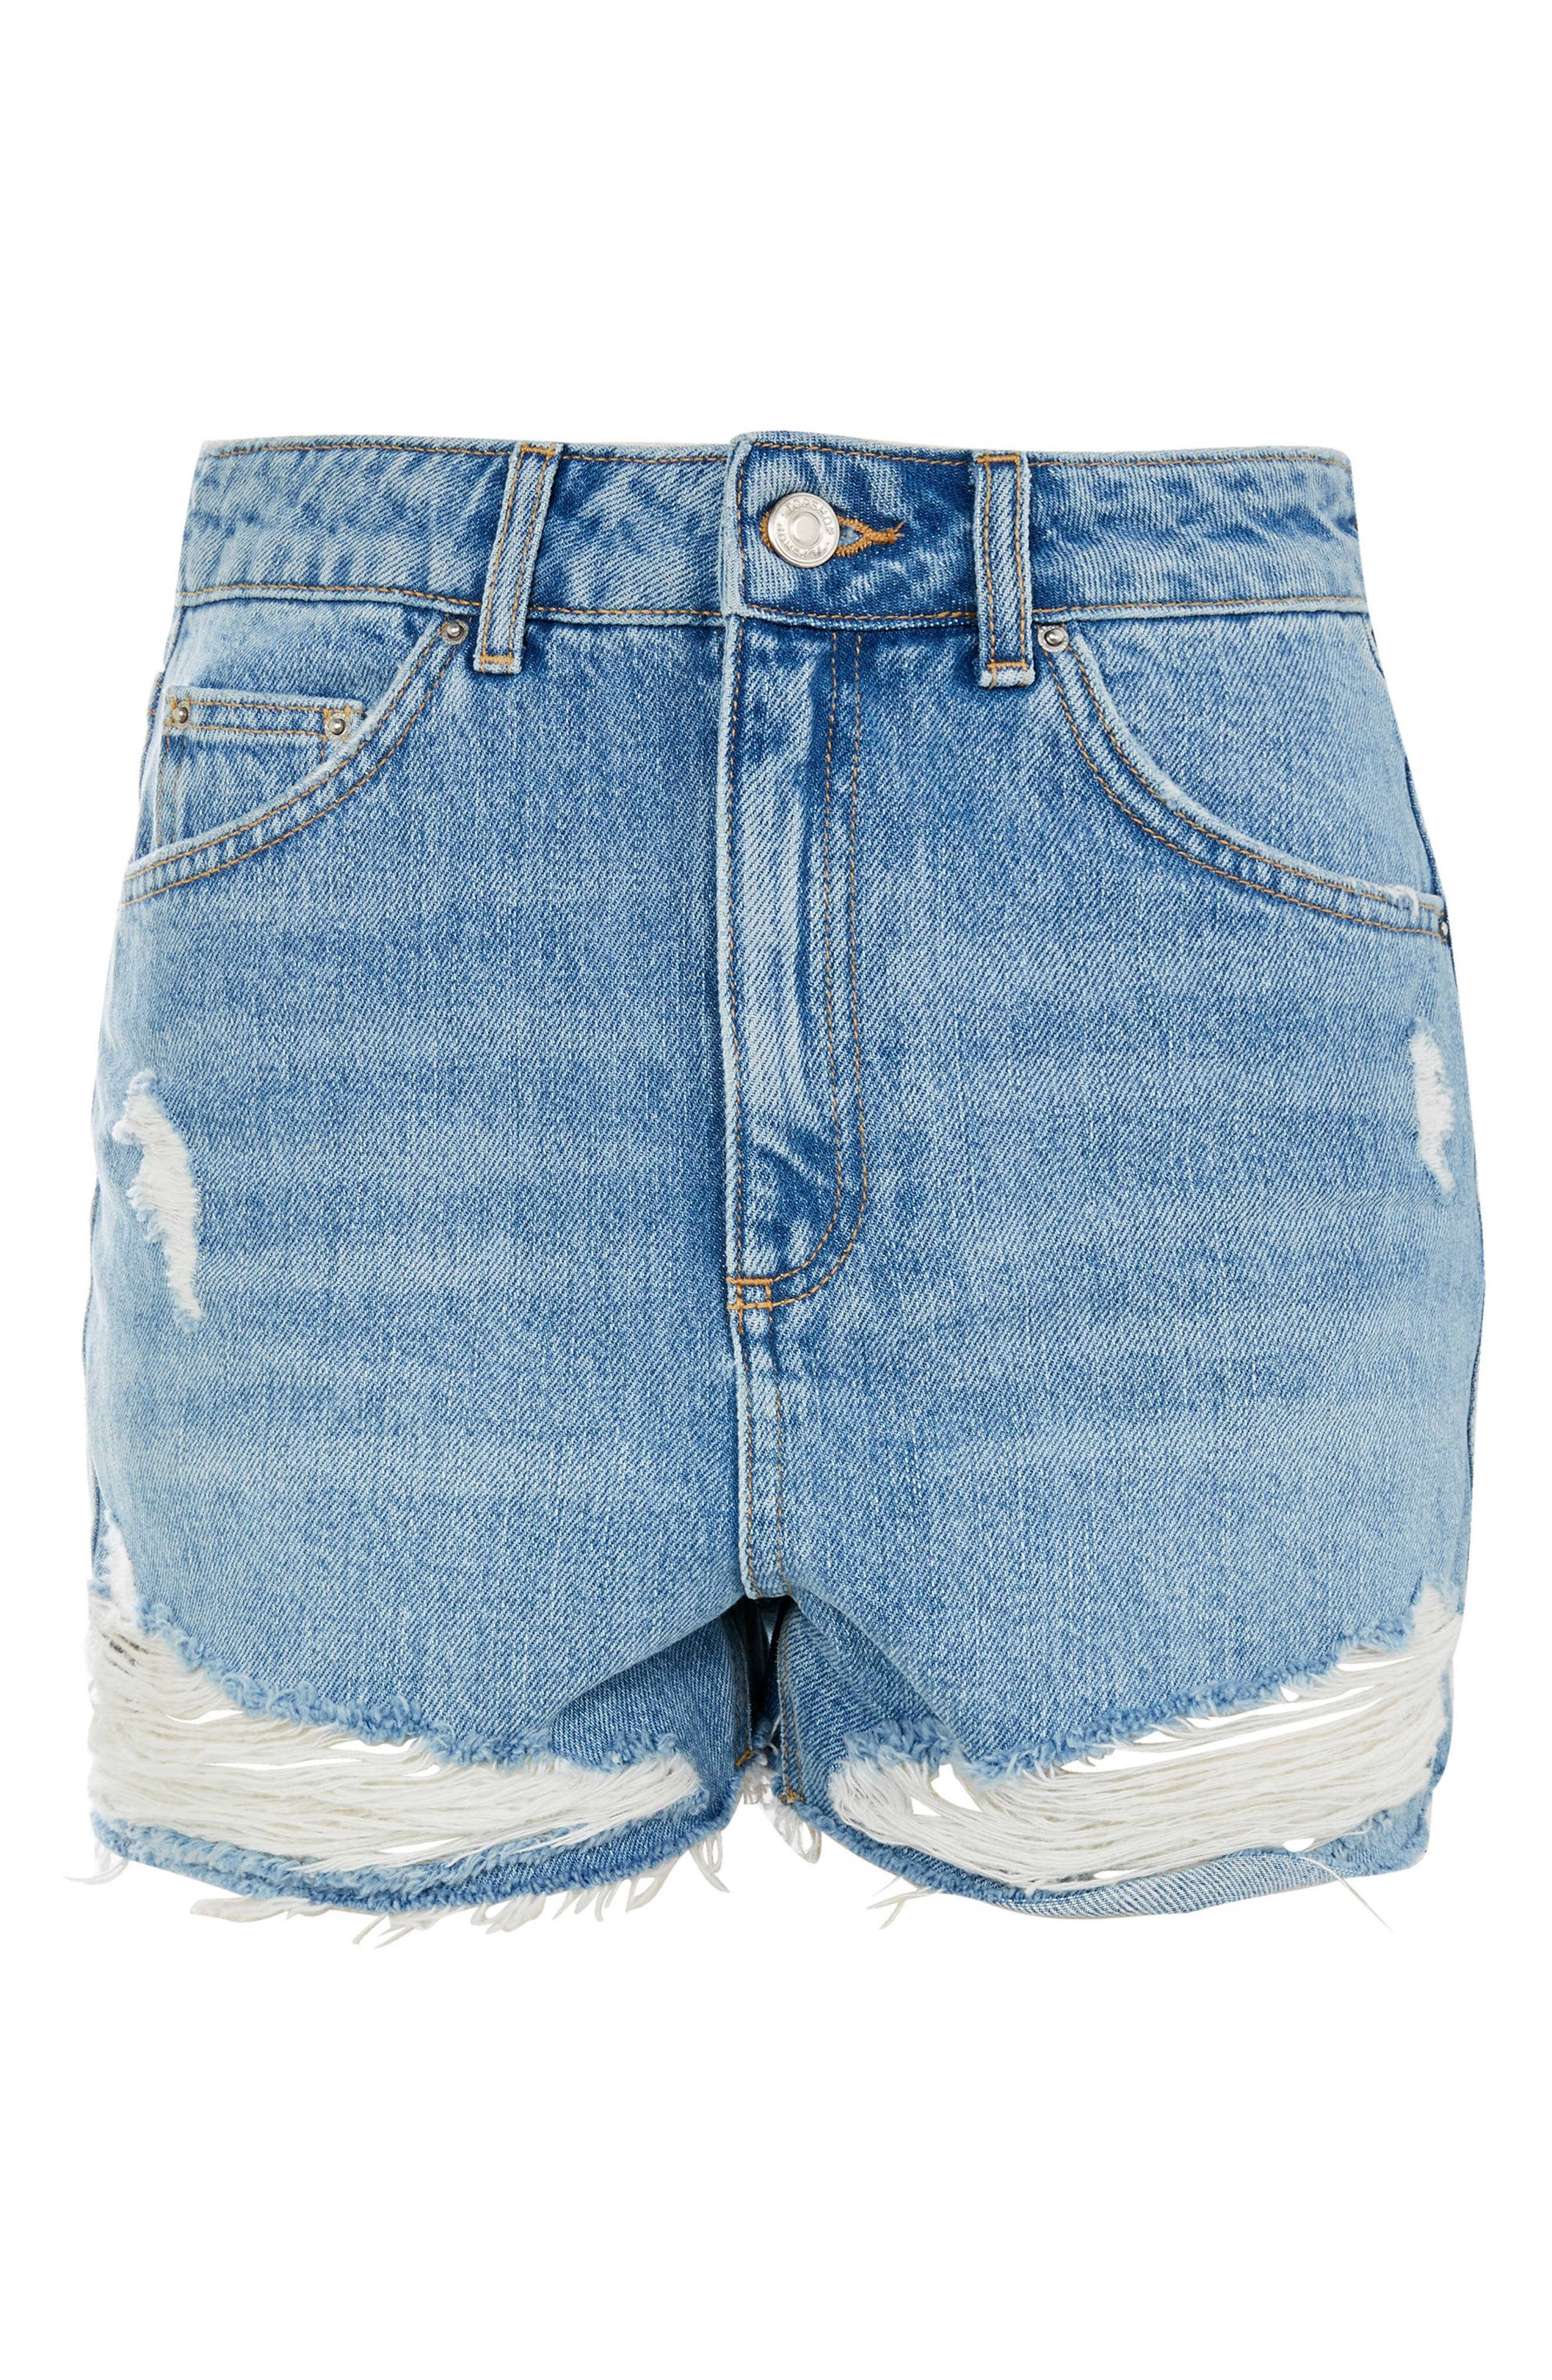 TOPSHOP, Ripped Denim Mom Shorts, Alternate thumbnail 4, color, 400